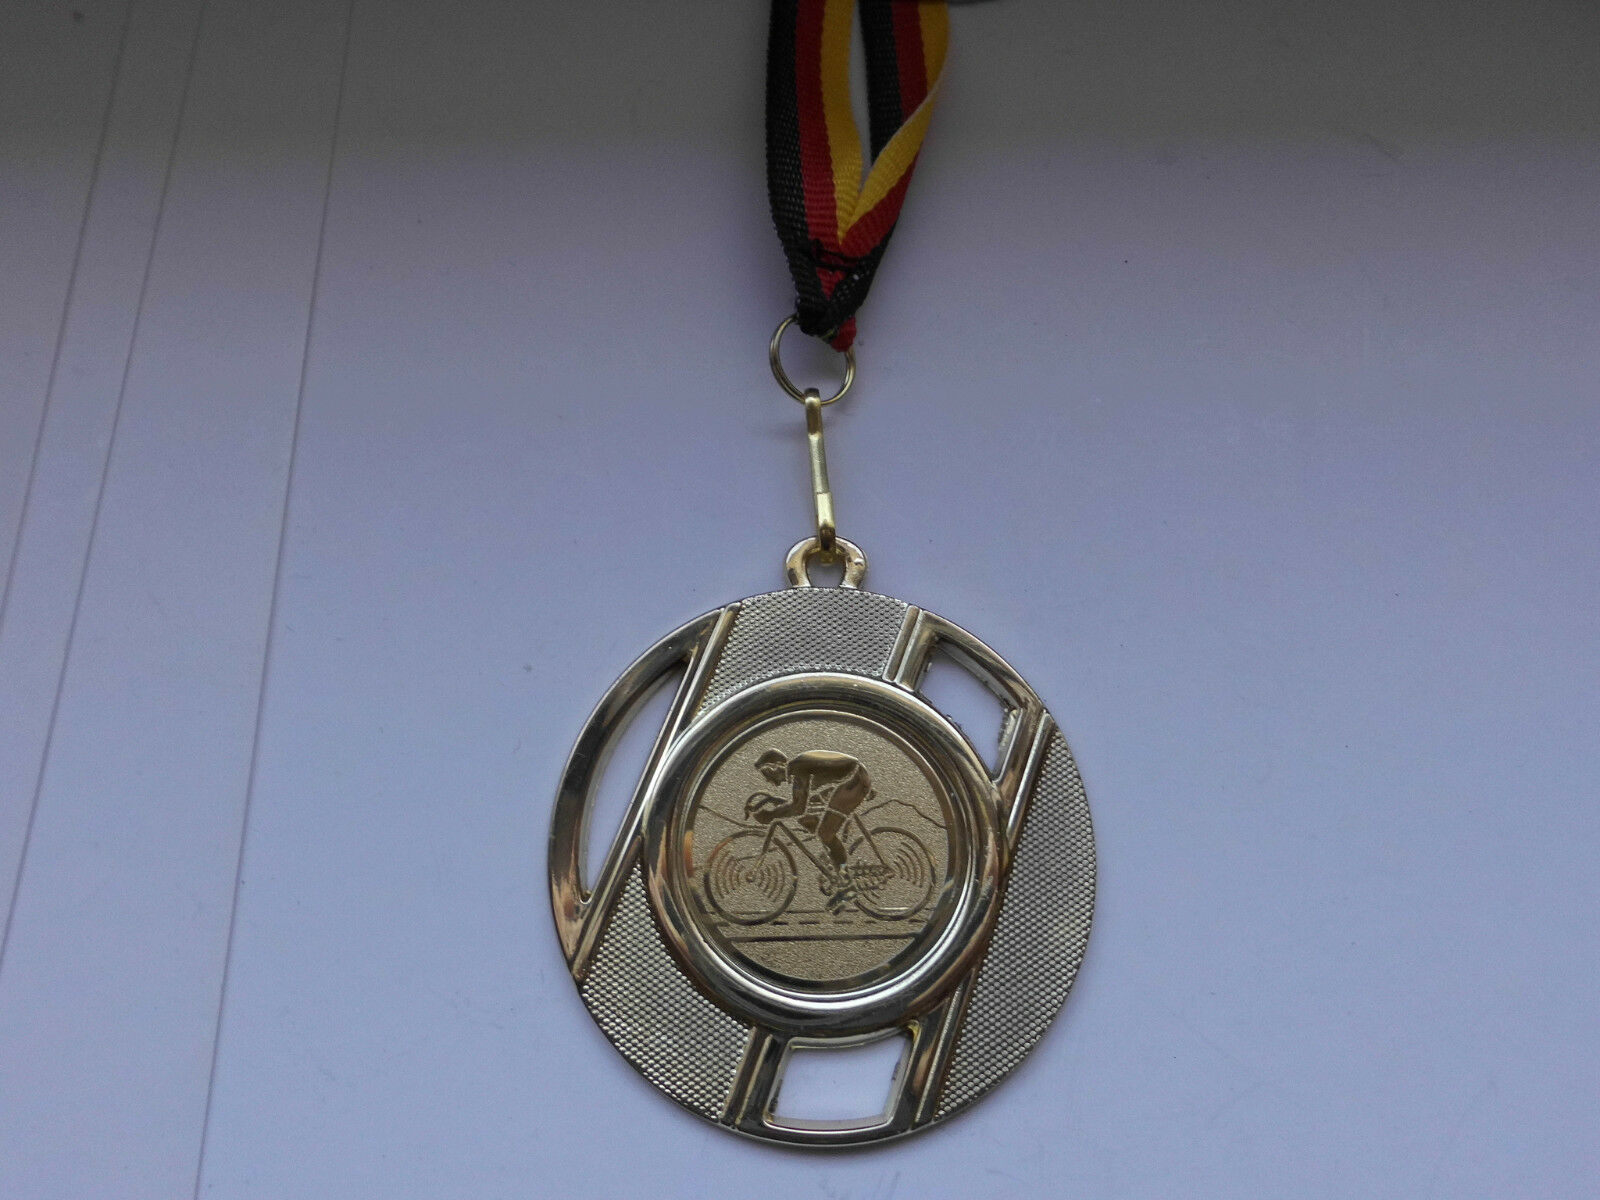 Radfahren Pokal Kids 50 x Medaillen Pokale m. Deutschland-Band Turnier Emblem Pokale Medaillen 4aabc8